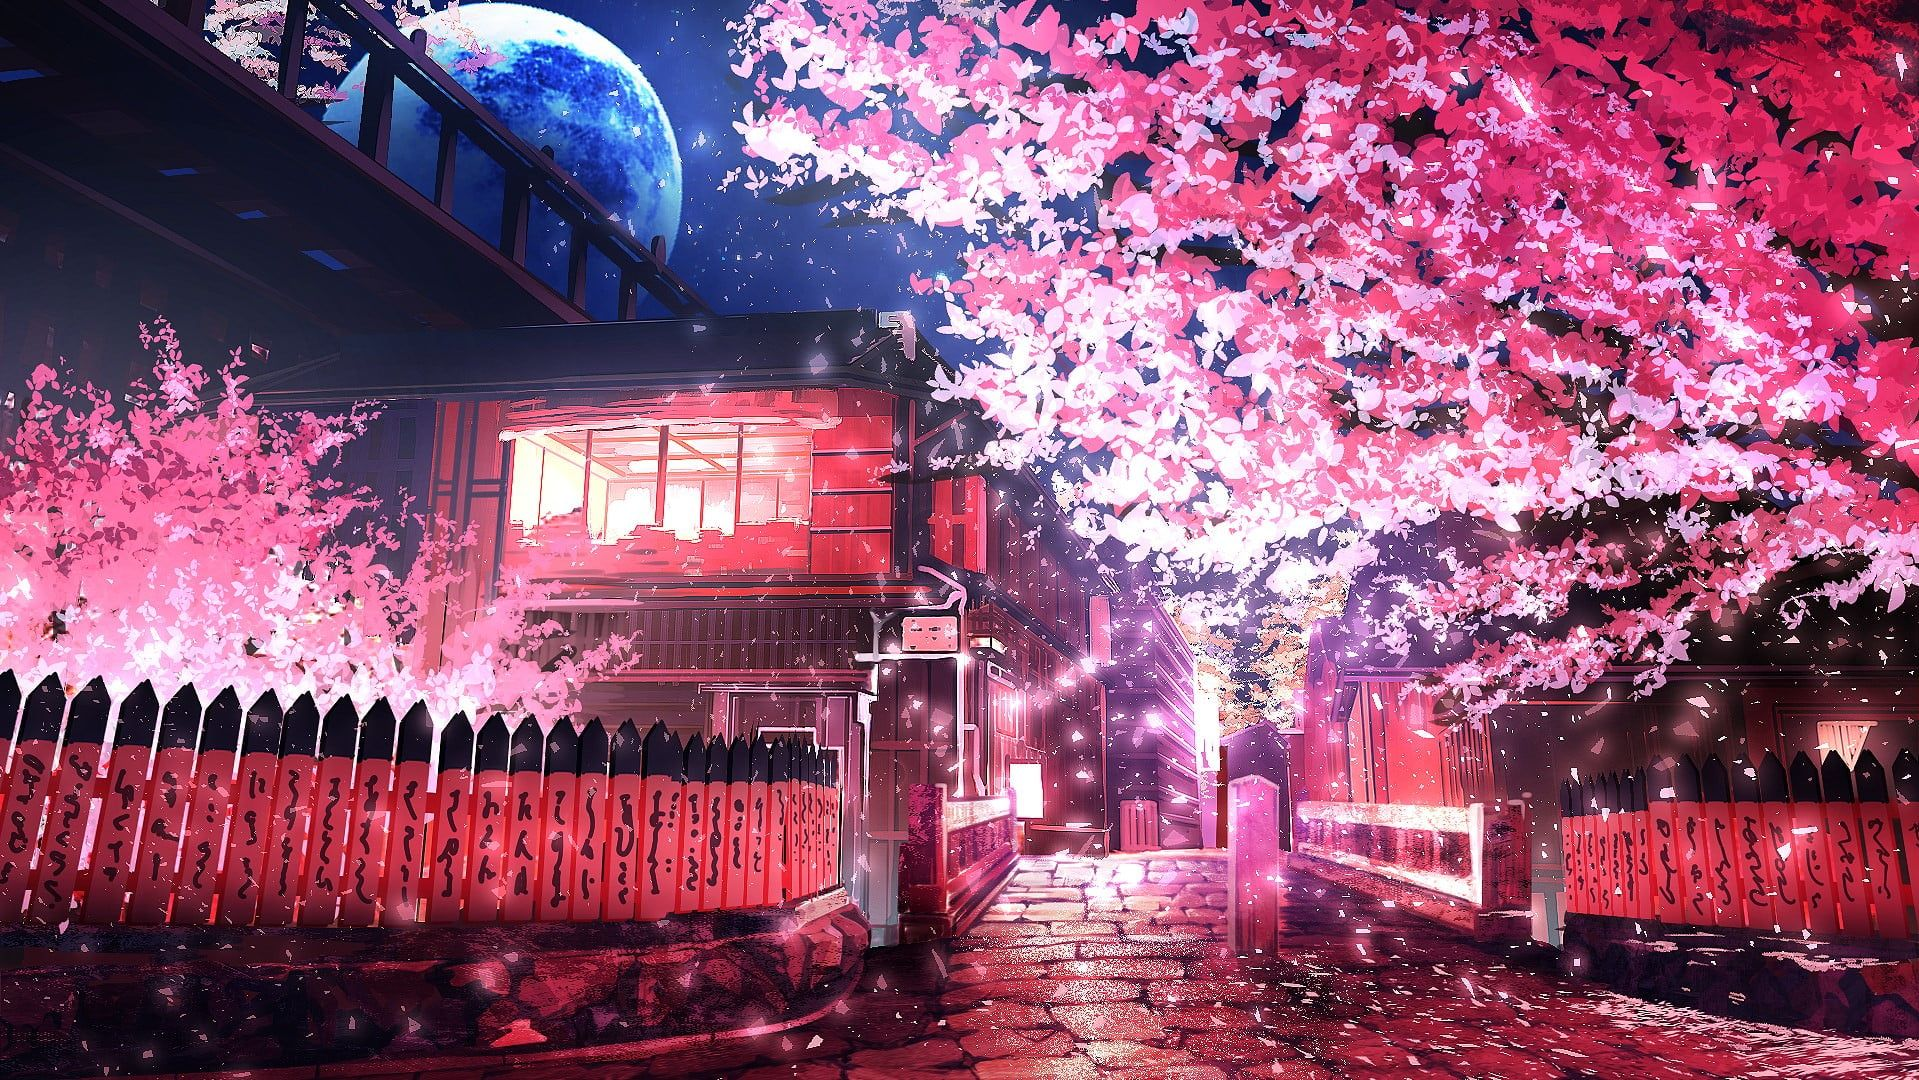 Pink Leafed Tree Anime Sakura Tree Road 720p Wallpaper Hdwallpaper Desktop In 2020 Anime Scenery Landscape Wallpaper Pink Wallpaper Anime